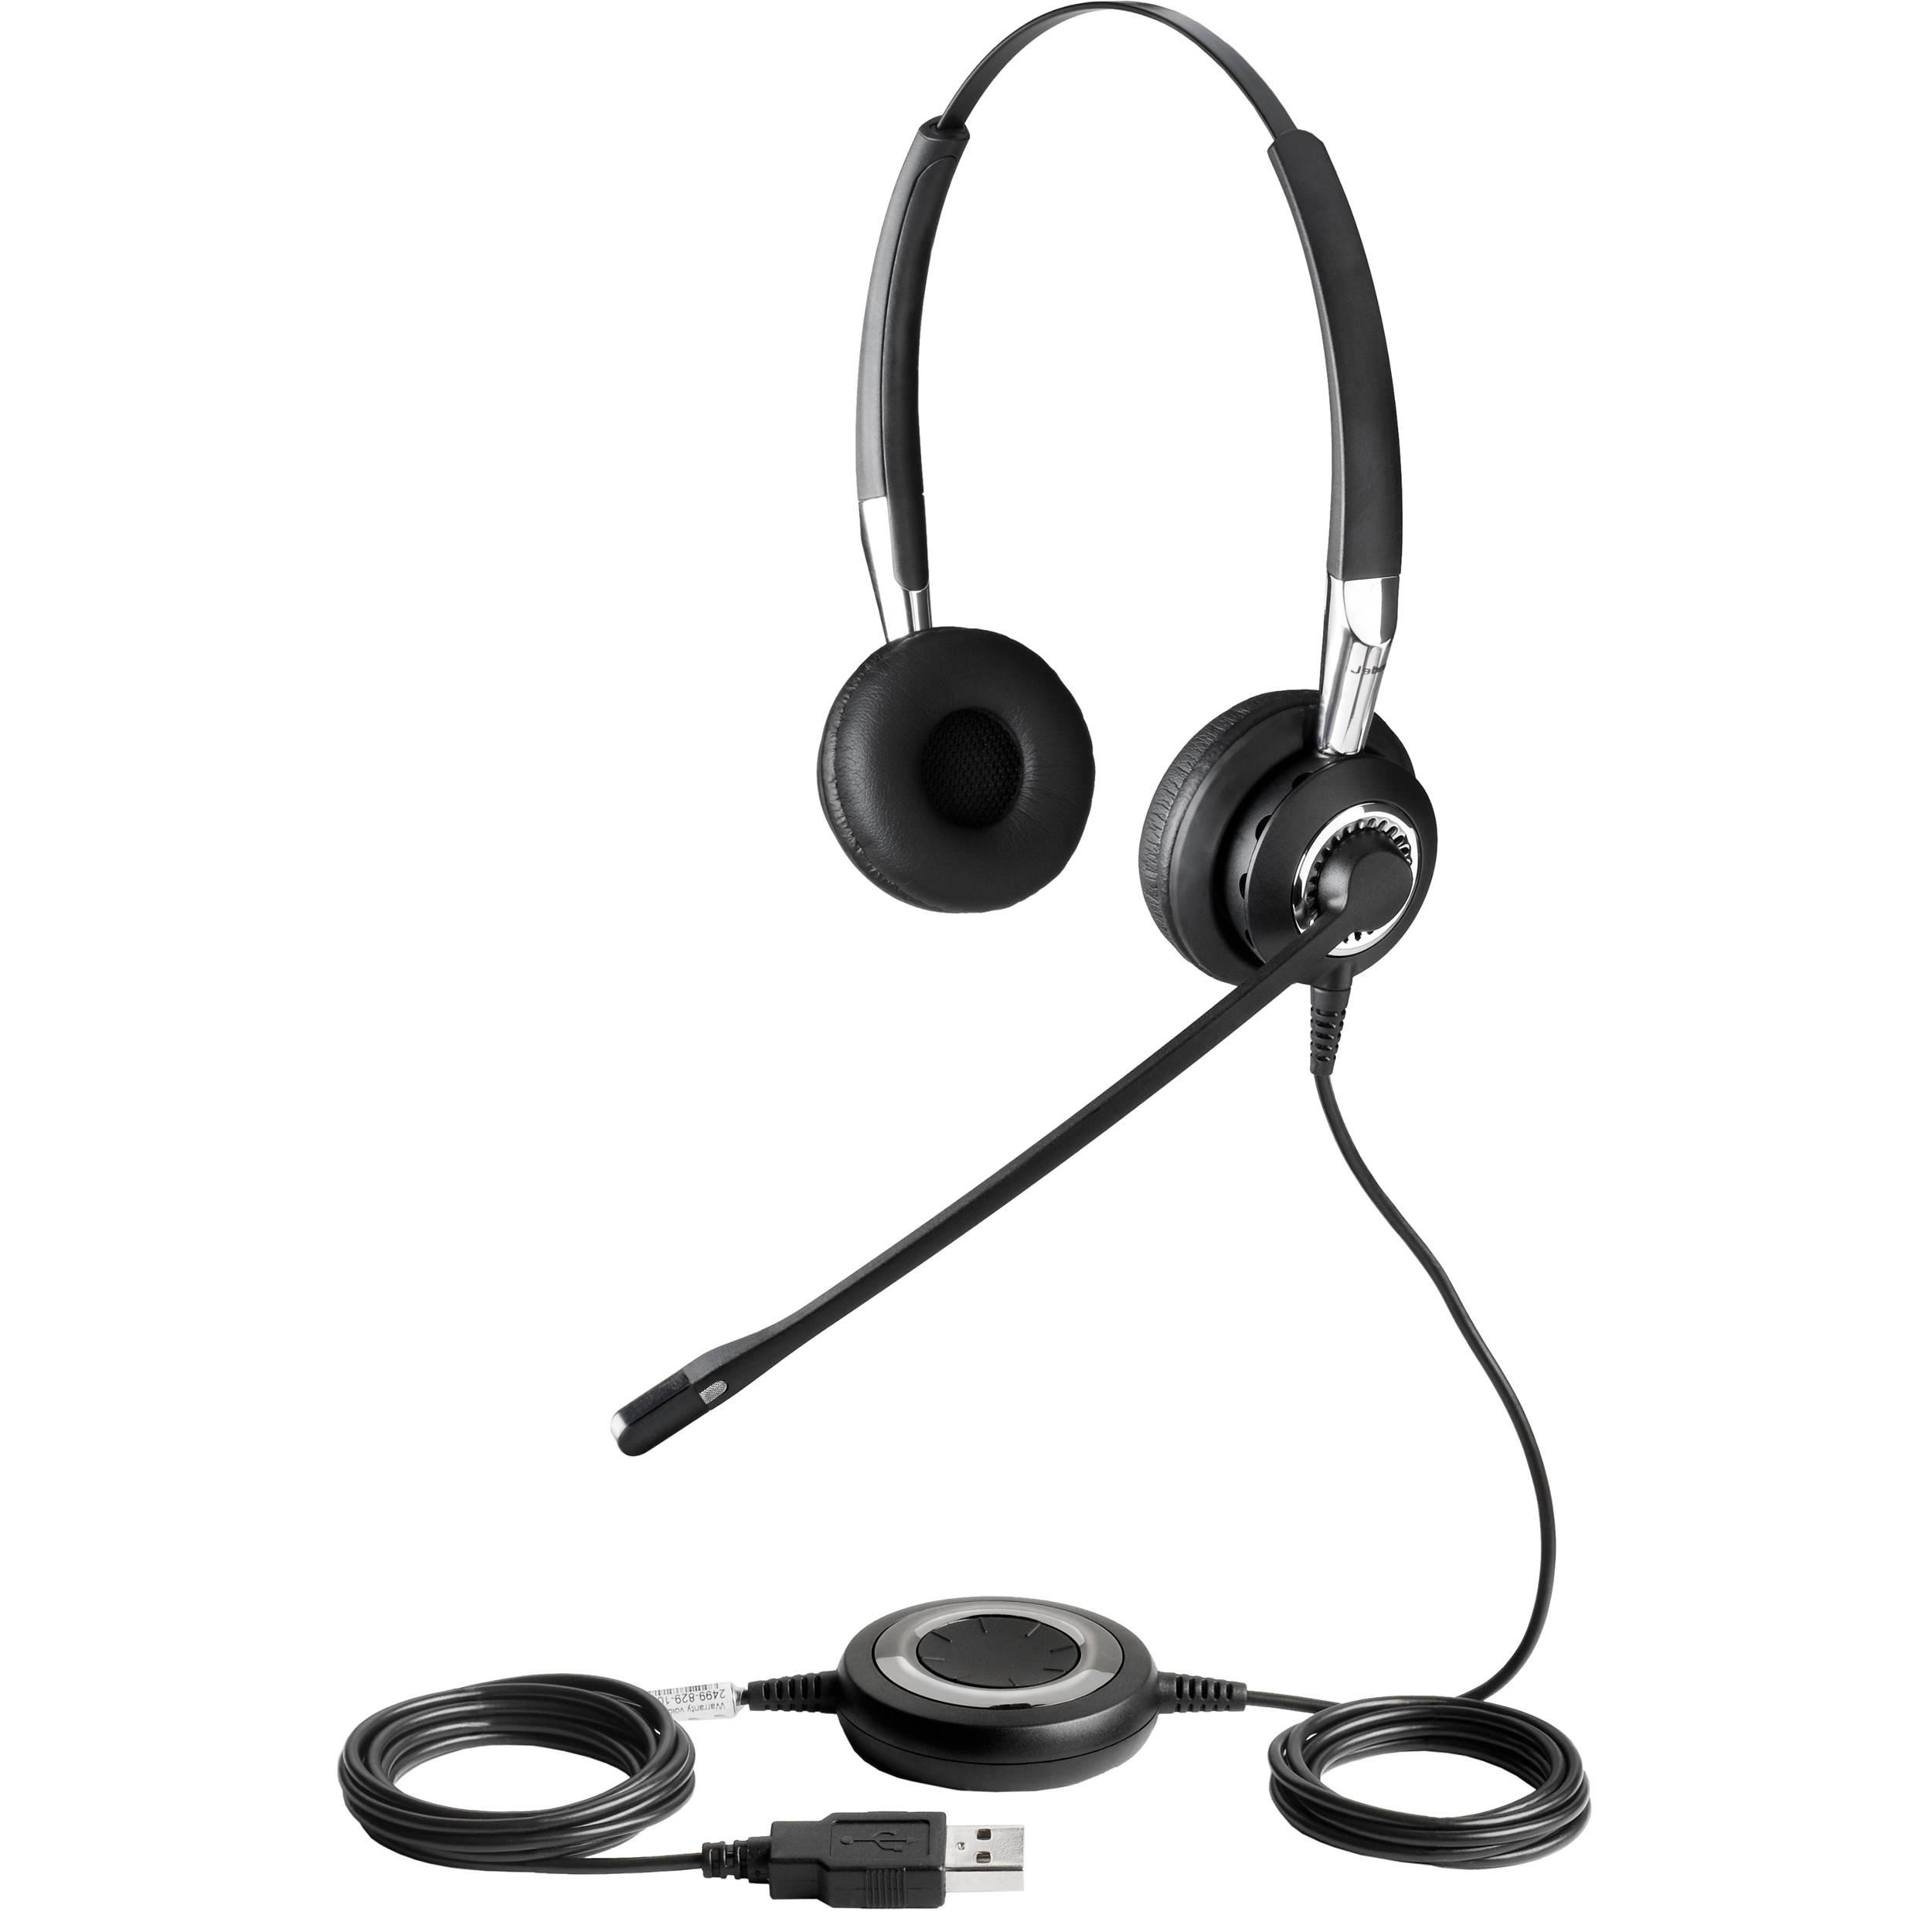 Jabra Biz 2400 Usb Duo Headset 2499 823 105 B H Photo Video